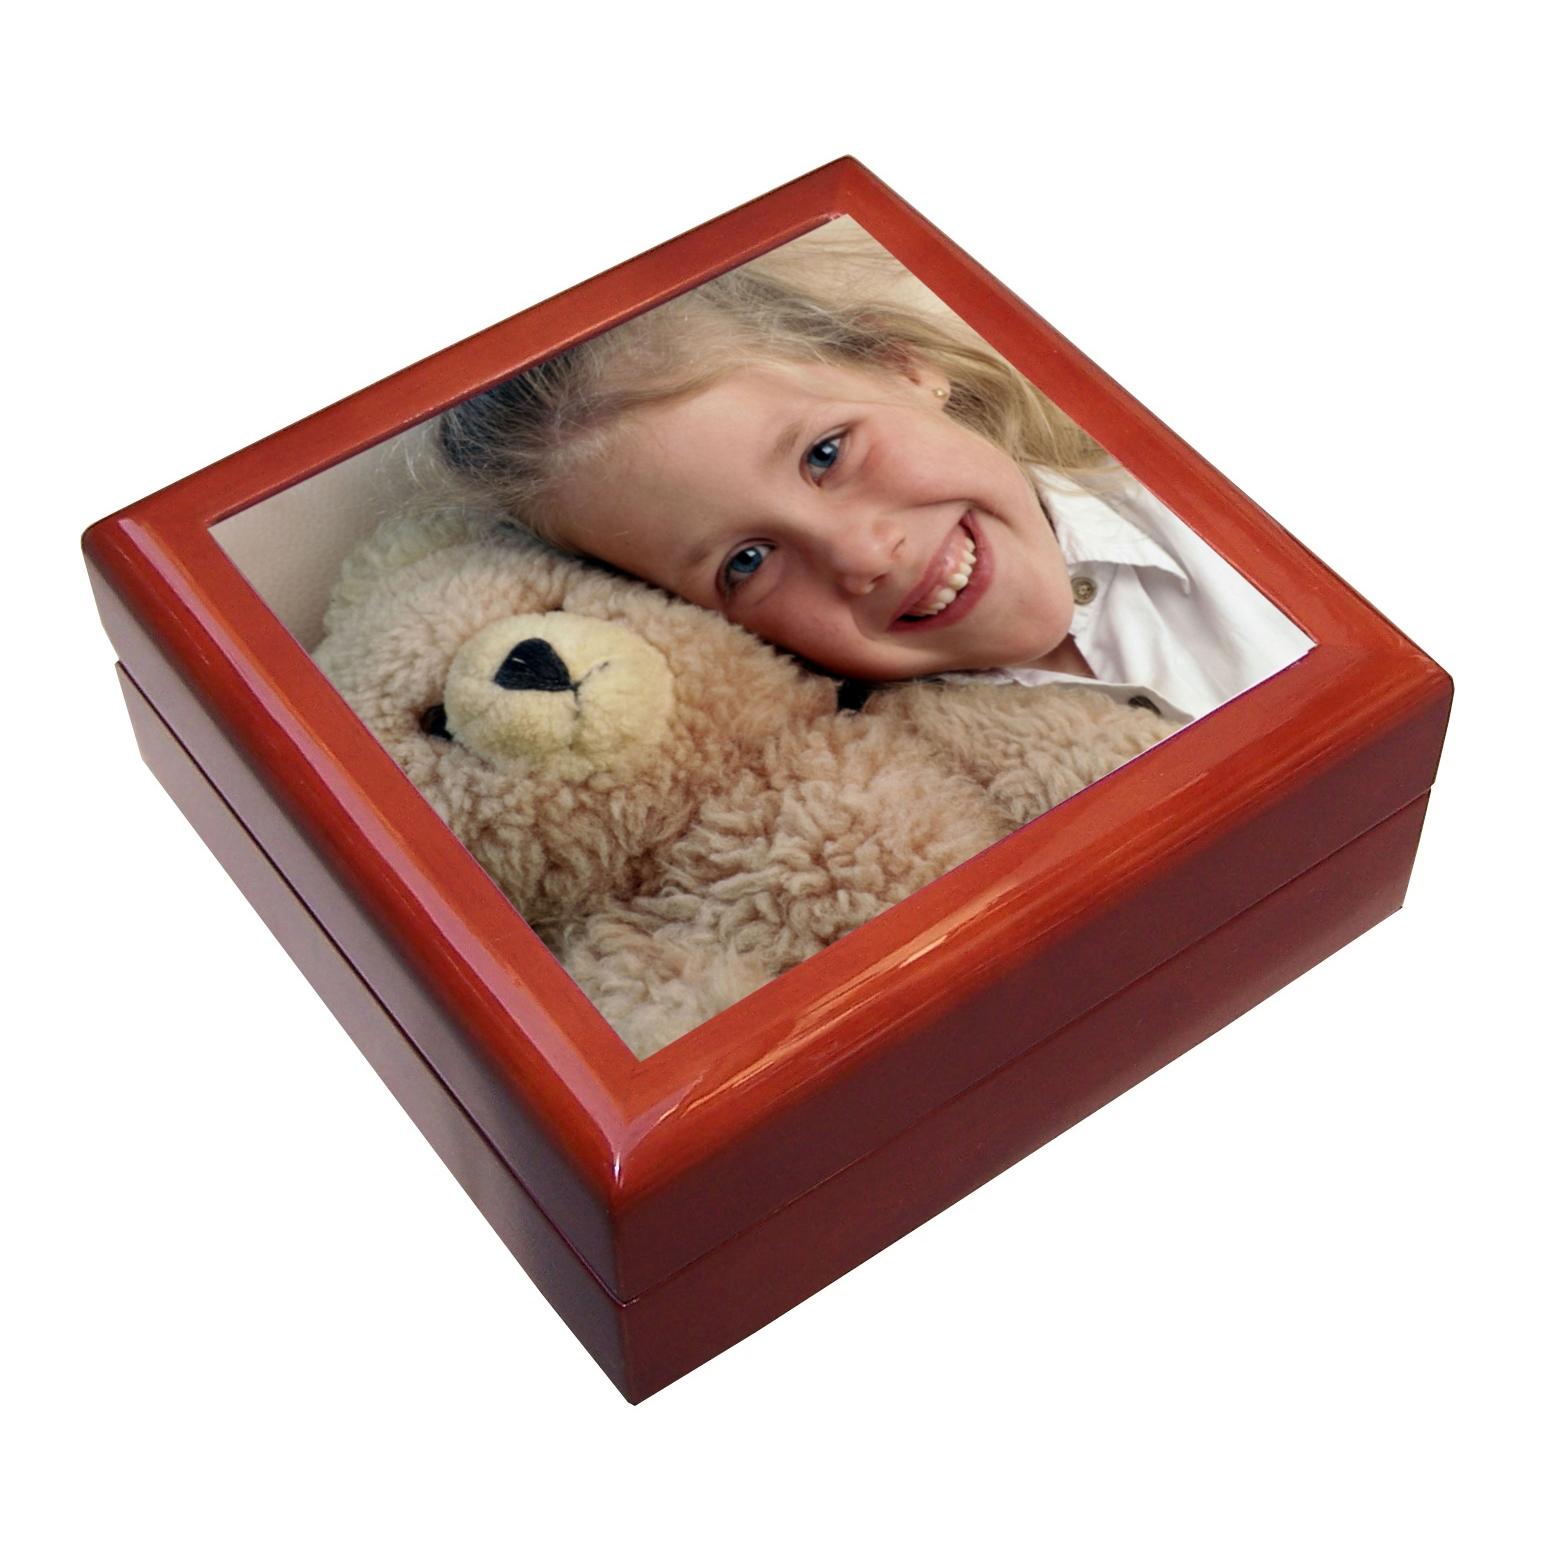 cadeau personnalis la bo te bijoux photo. Black Bedroom Furniture Sets. Home Design Ideas